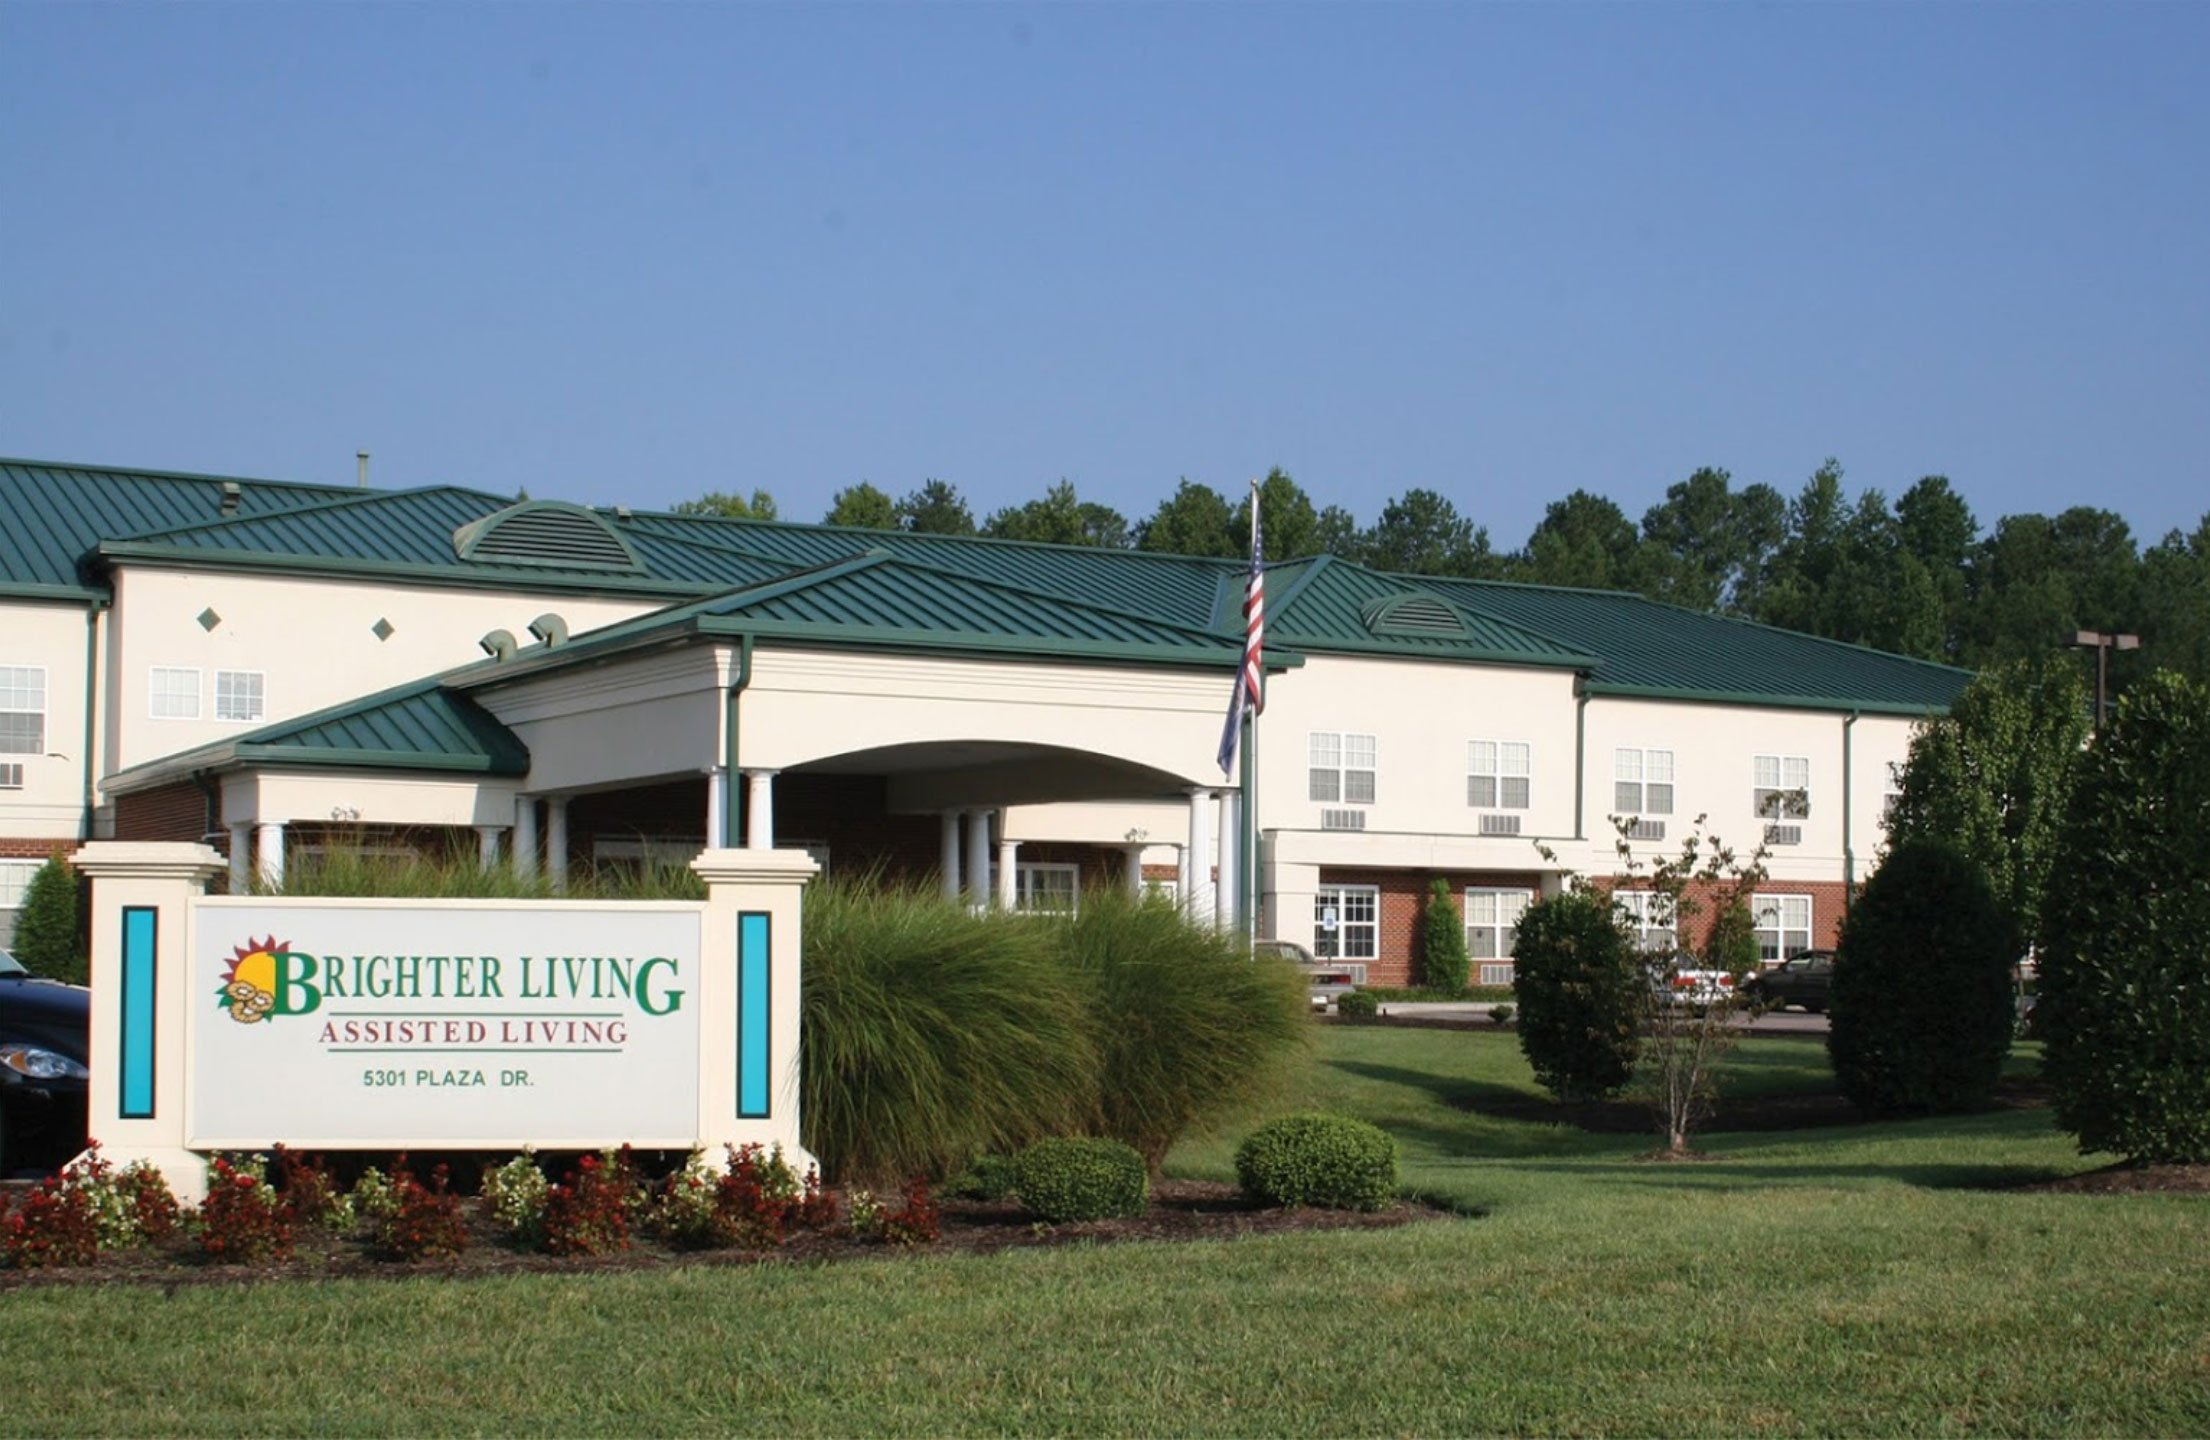 Brighter Living Assisted Living Center – McAllister + Foltz